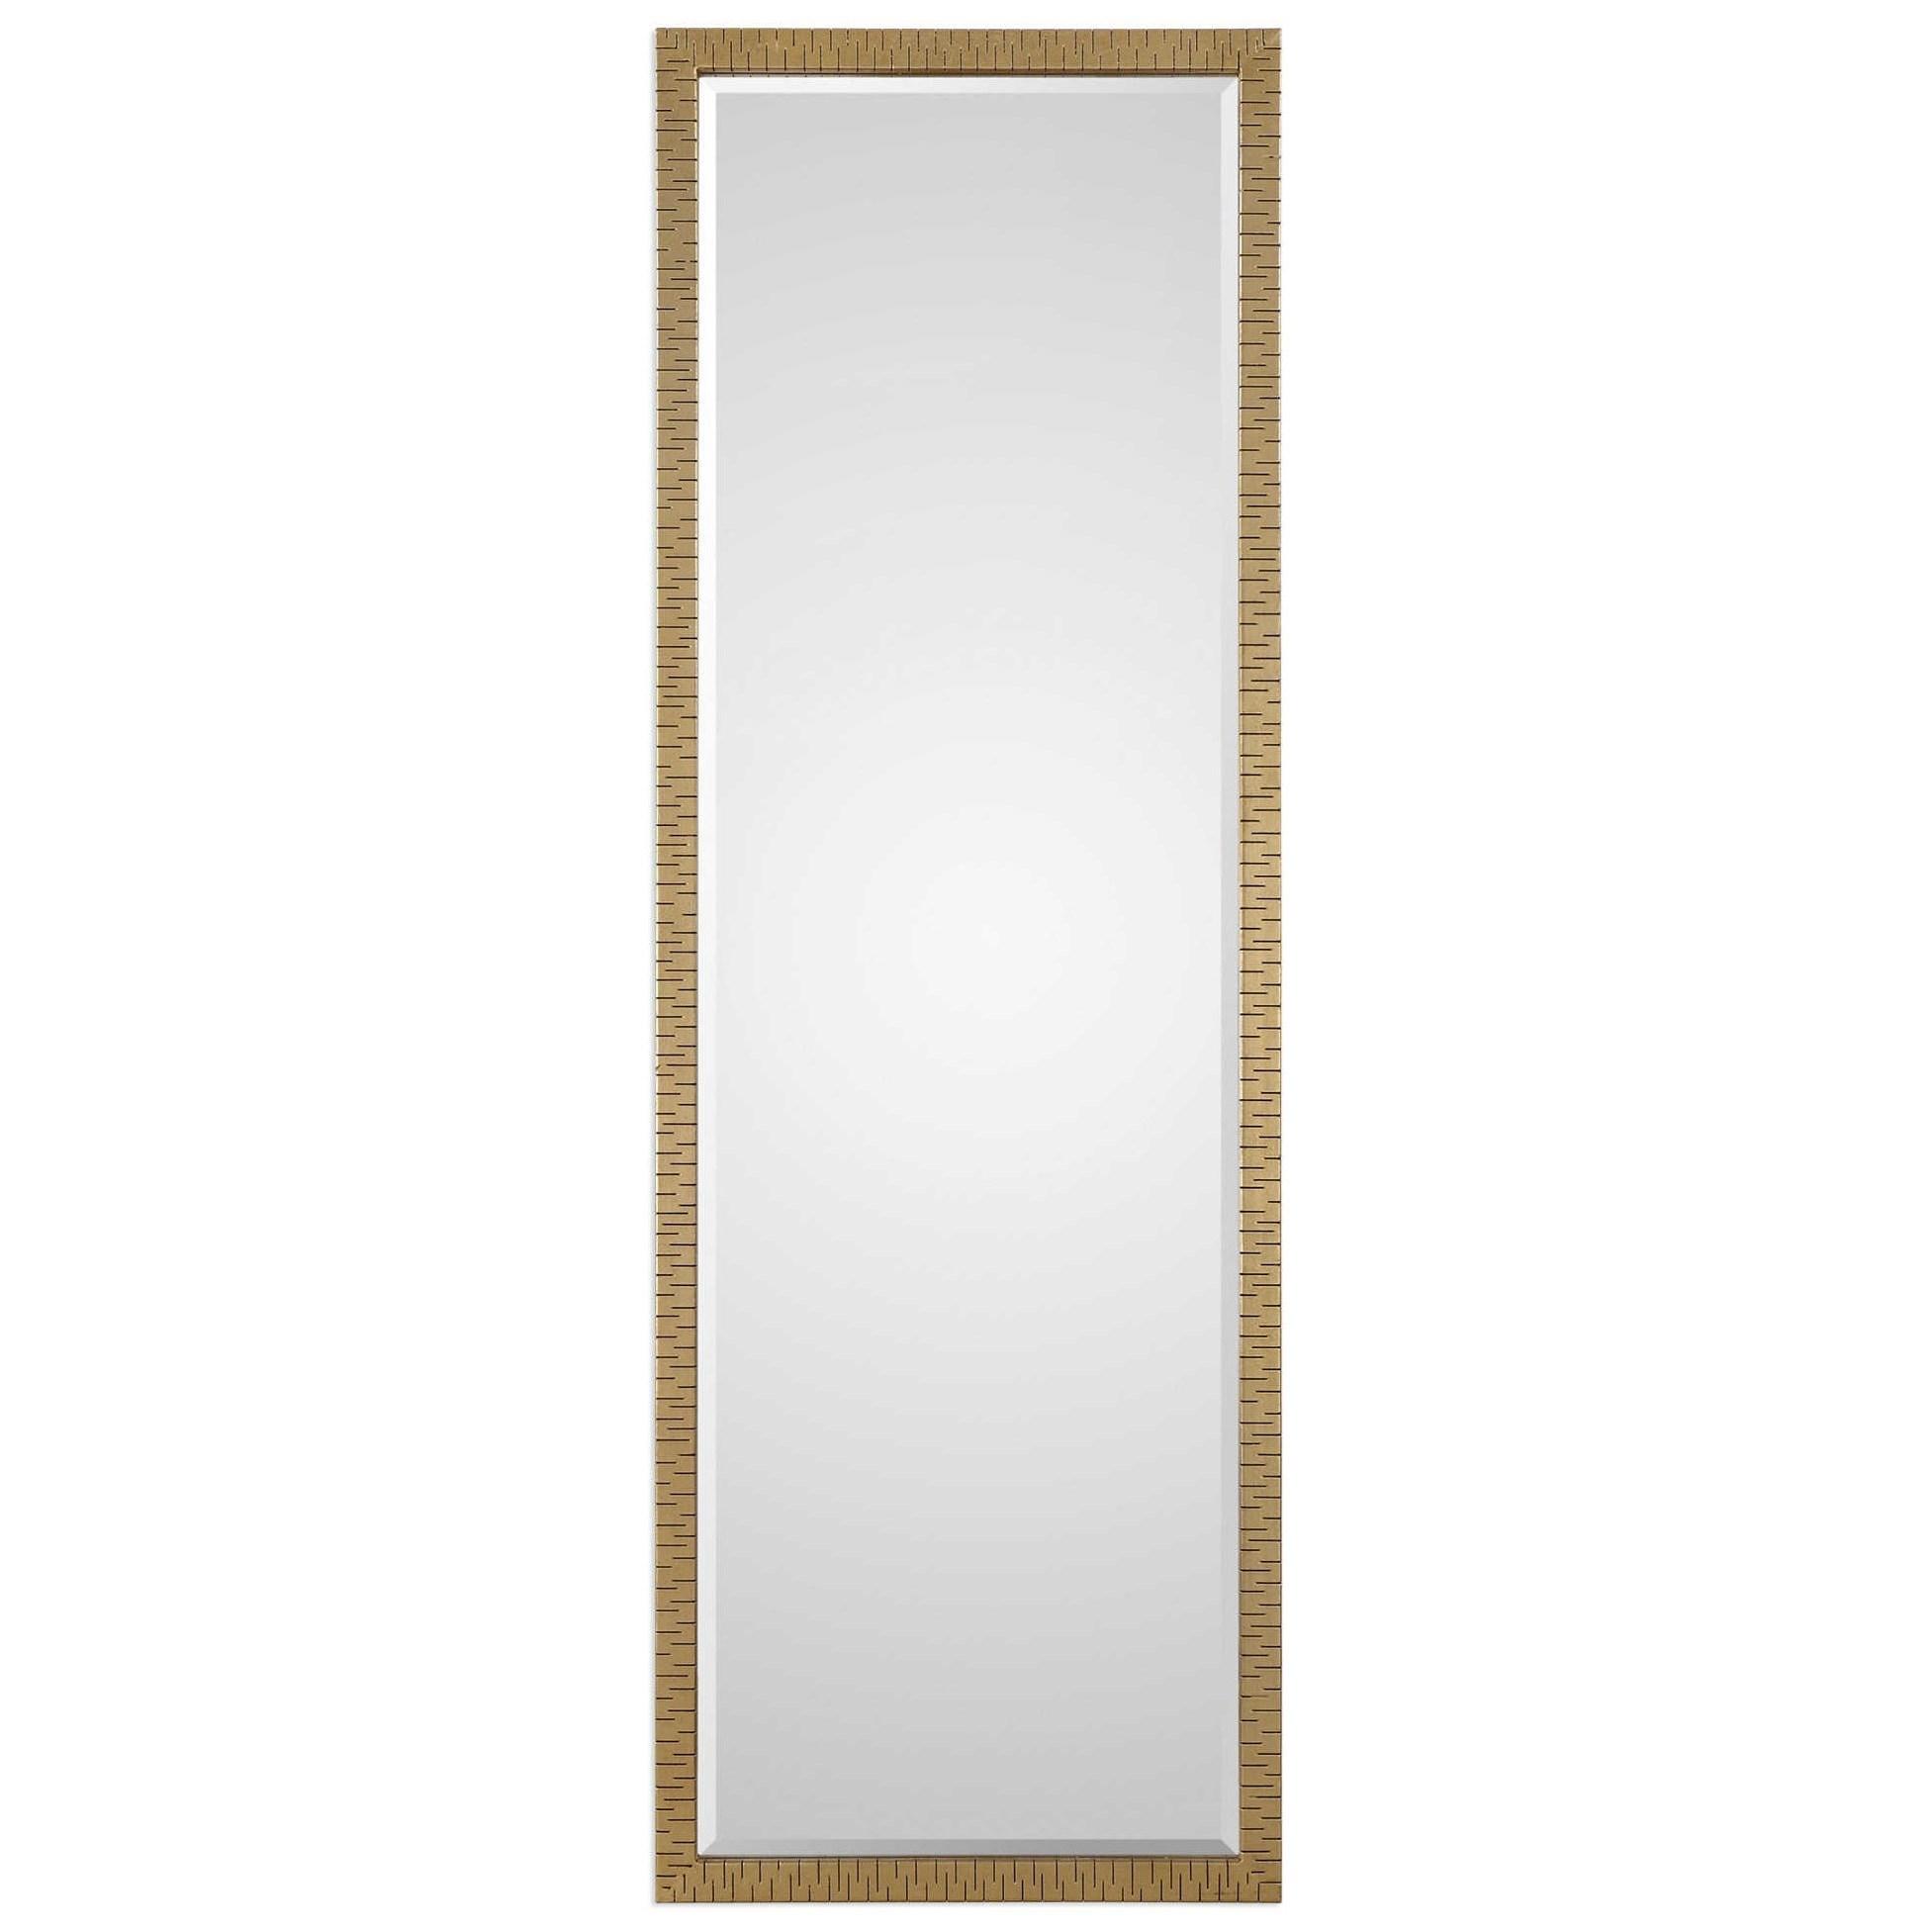 Uttermost Mirrors 09246 Vilmos Metallic Gold Mirror | Dunk U0026 Bright  Furniture | Wall Mirrors